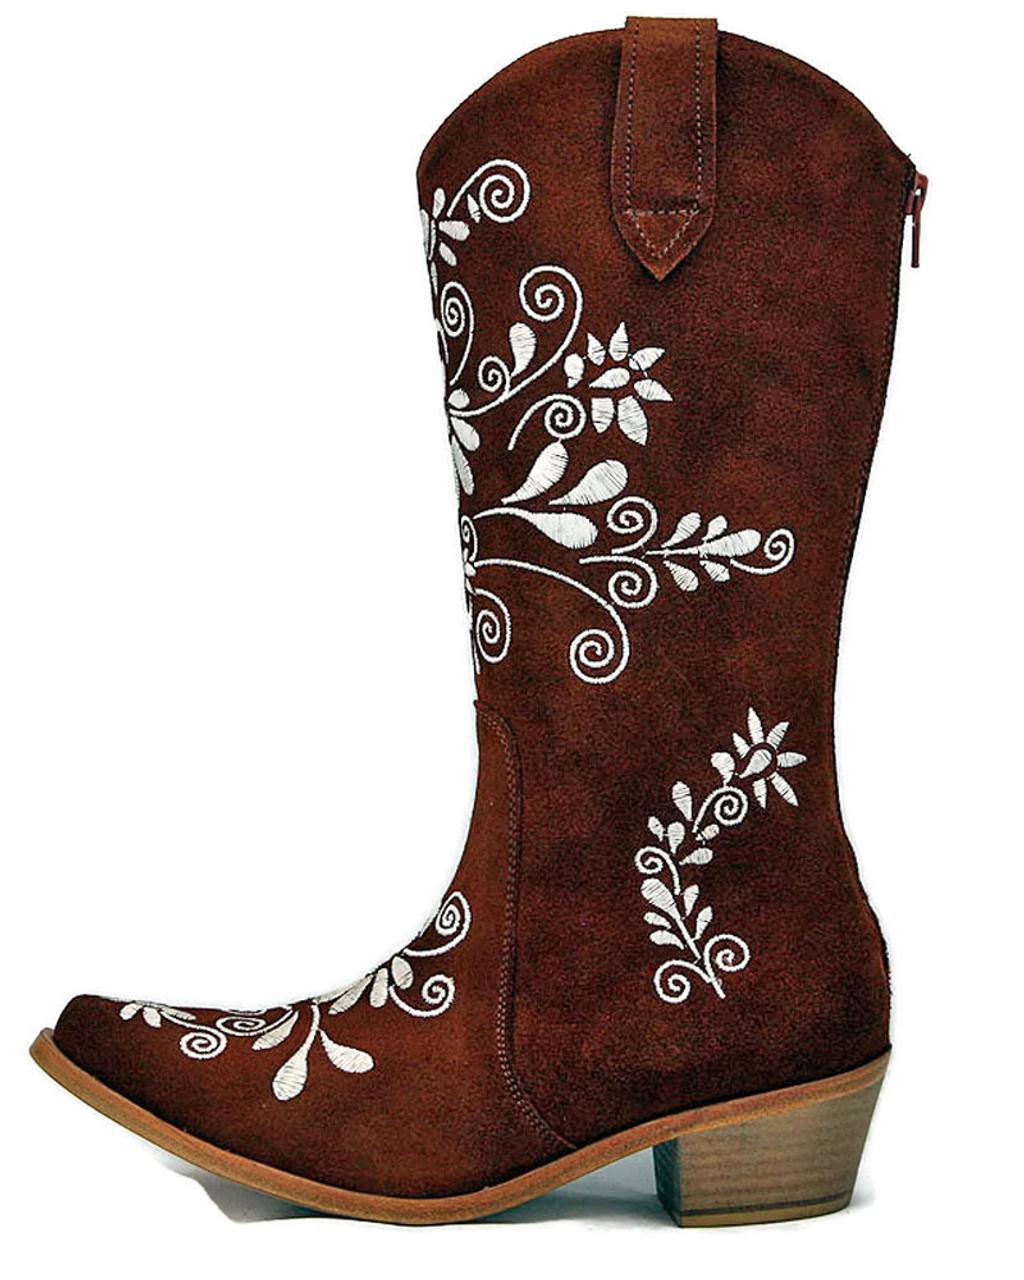 4faa5c90733 UT Longhorn GameDay Original Cowgirl Boots